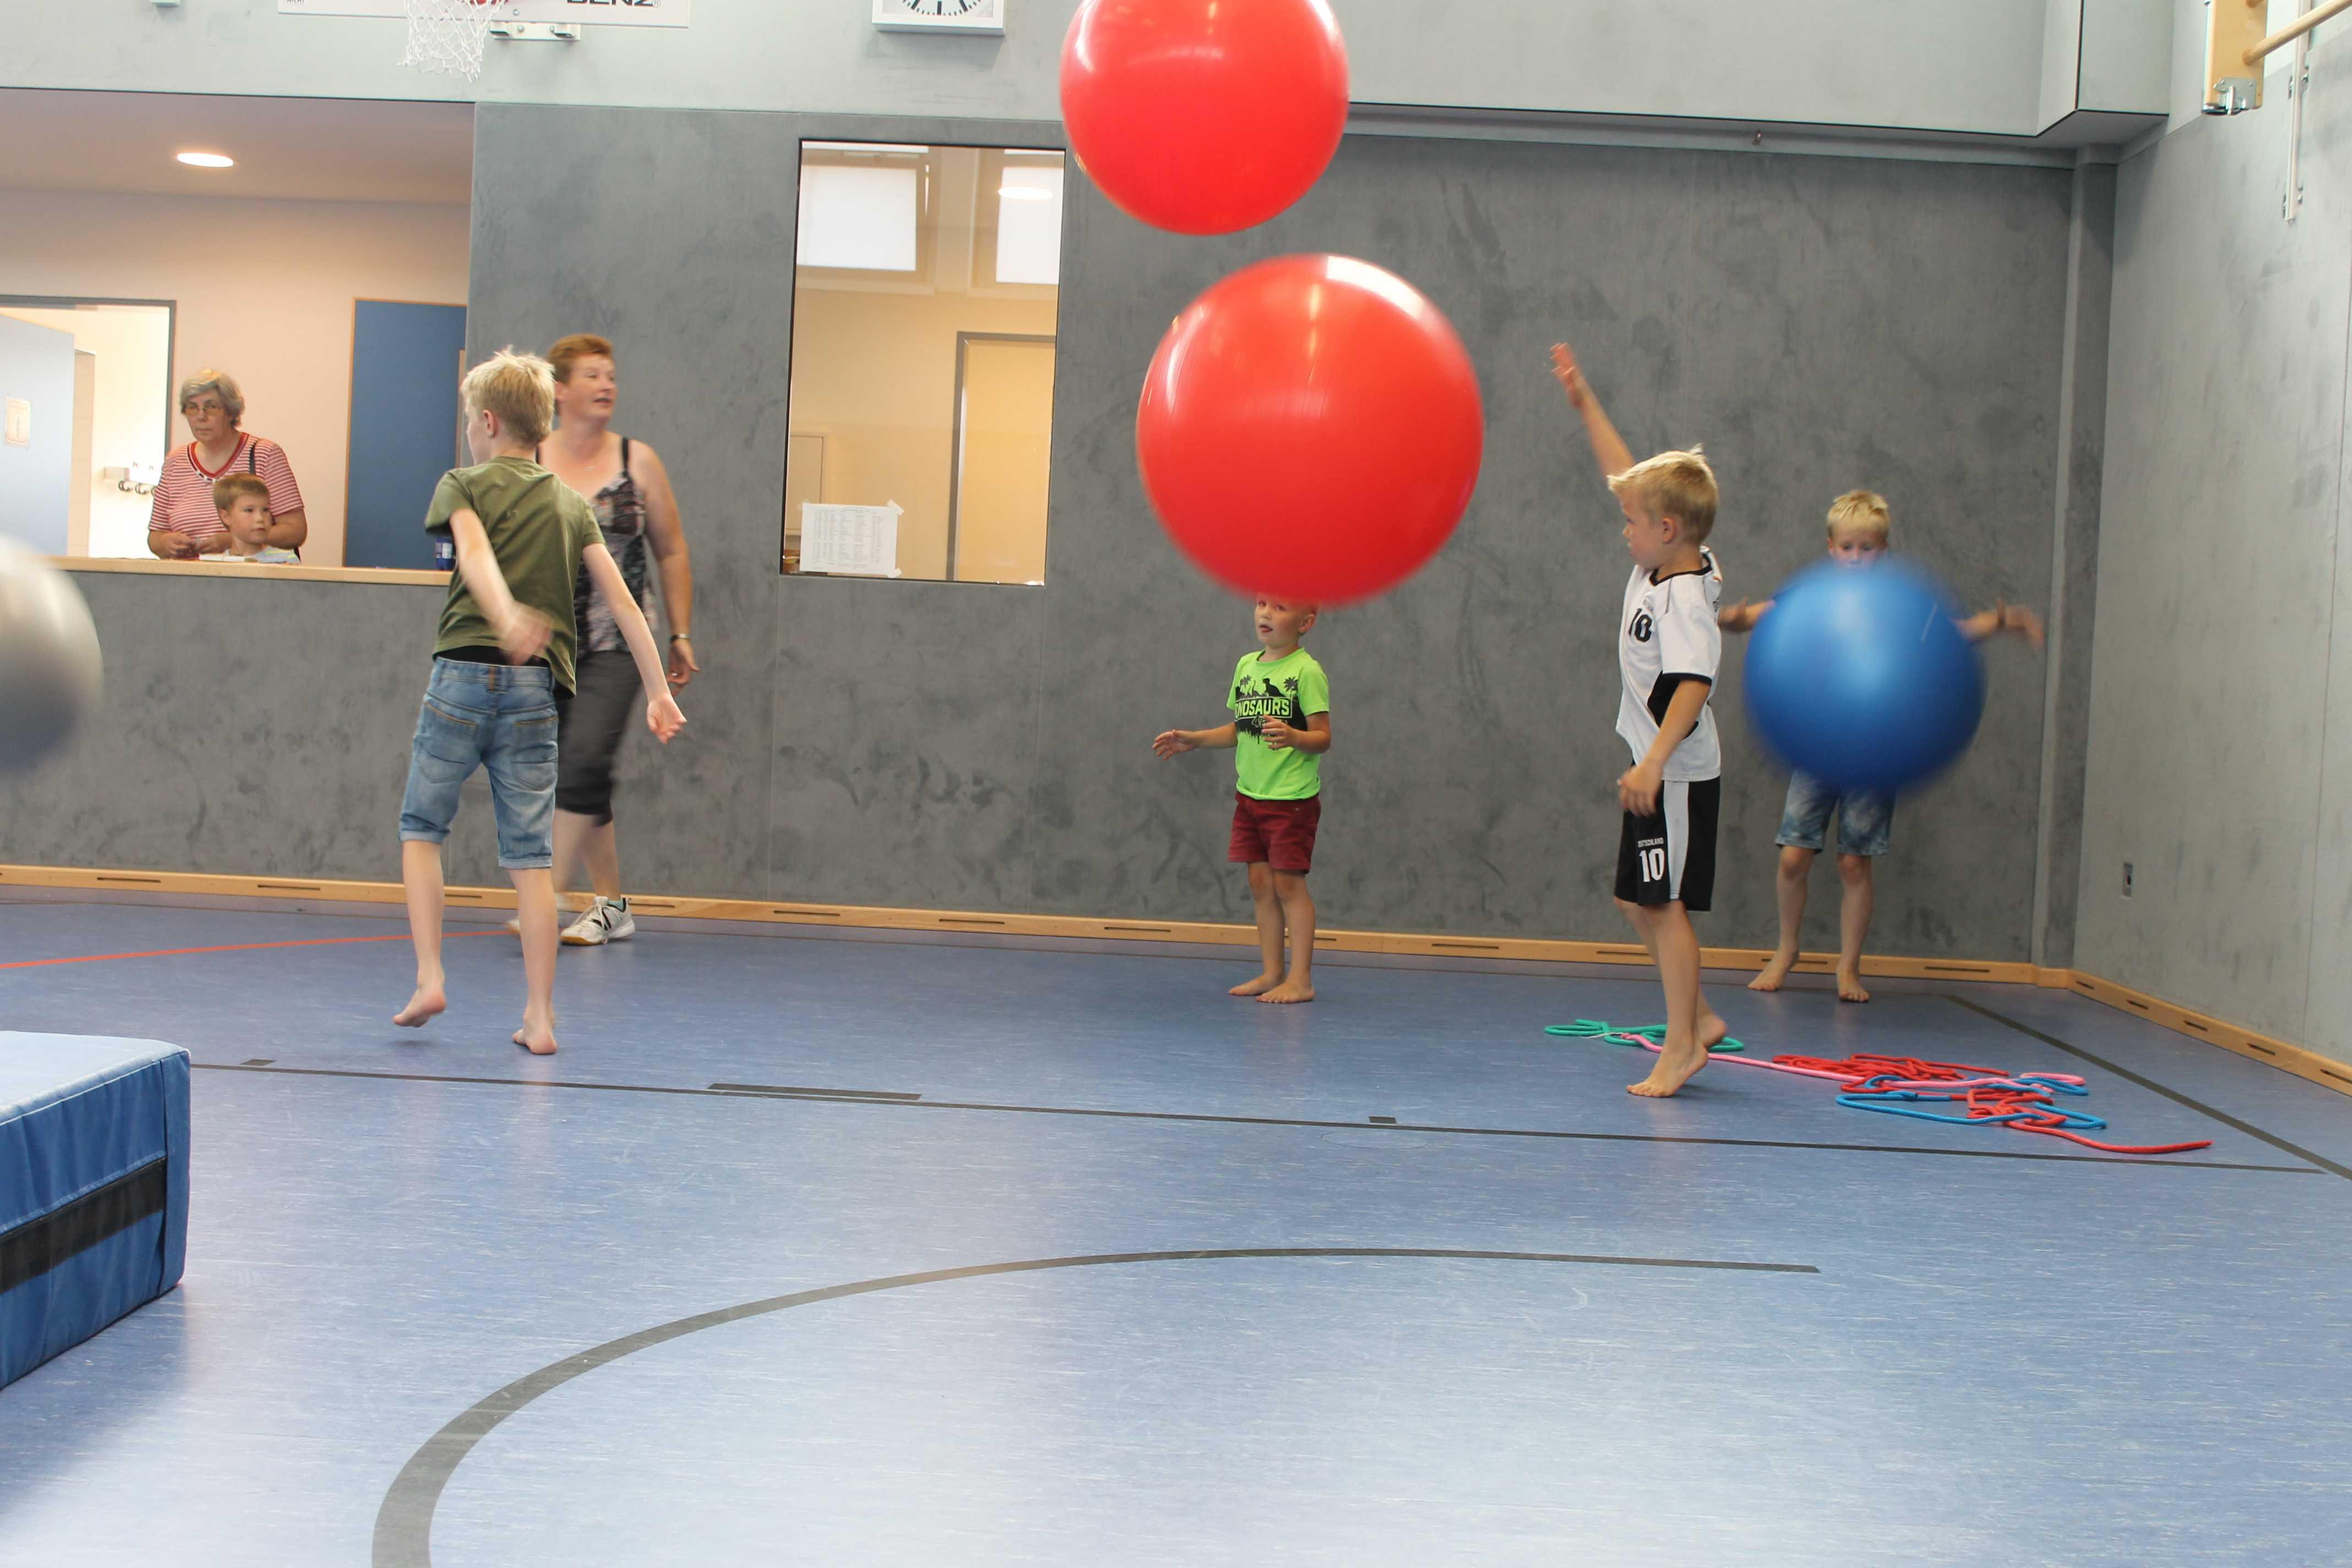 2018-07-29 Sportwoche - Sportpicknick & Football & Fußball (10)